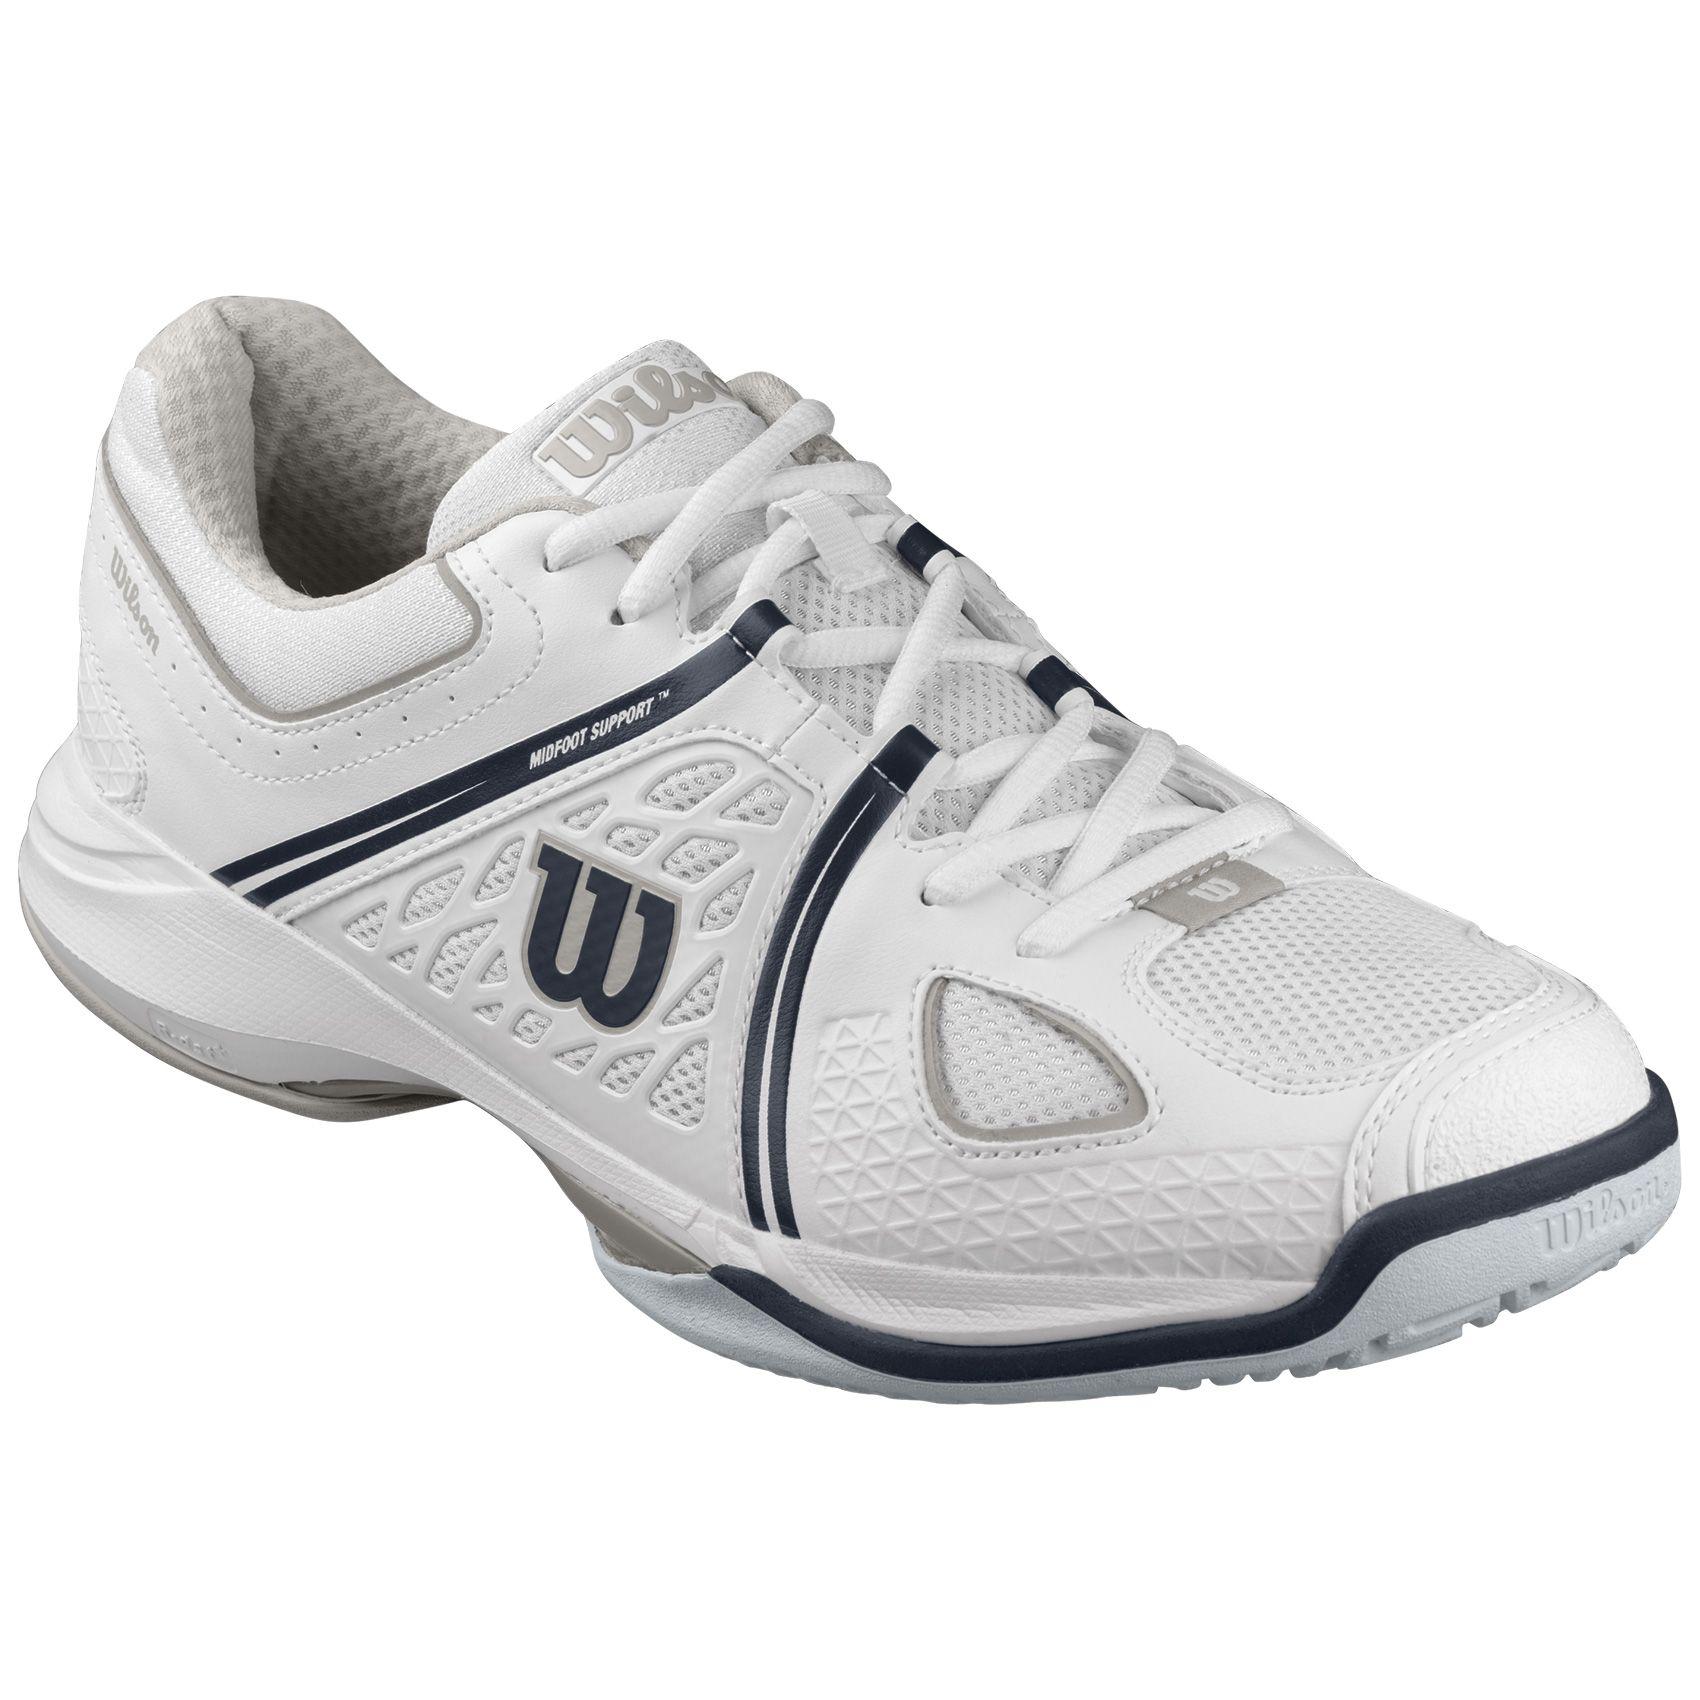 Best All Around Tennis Shoes